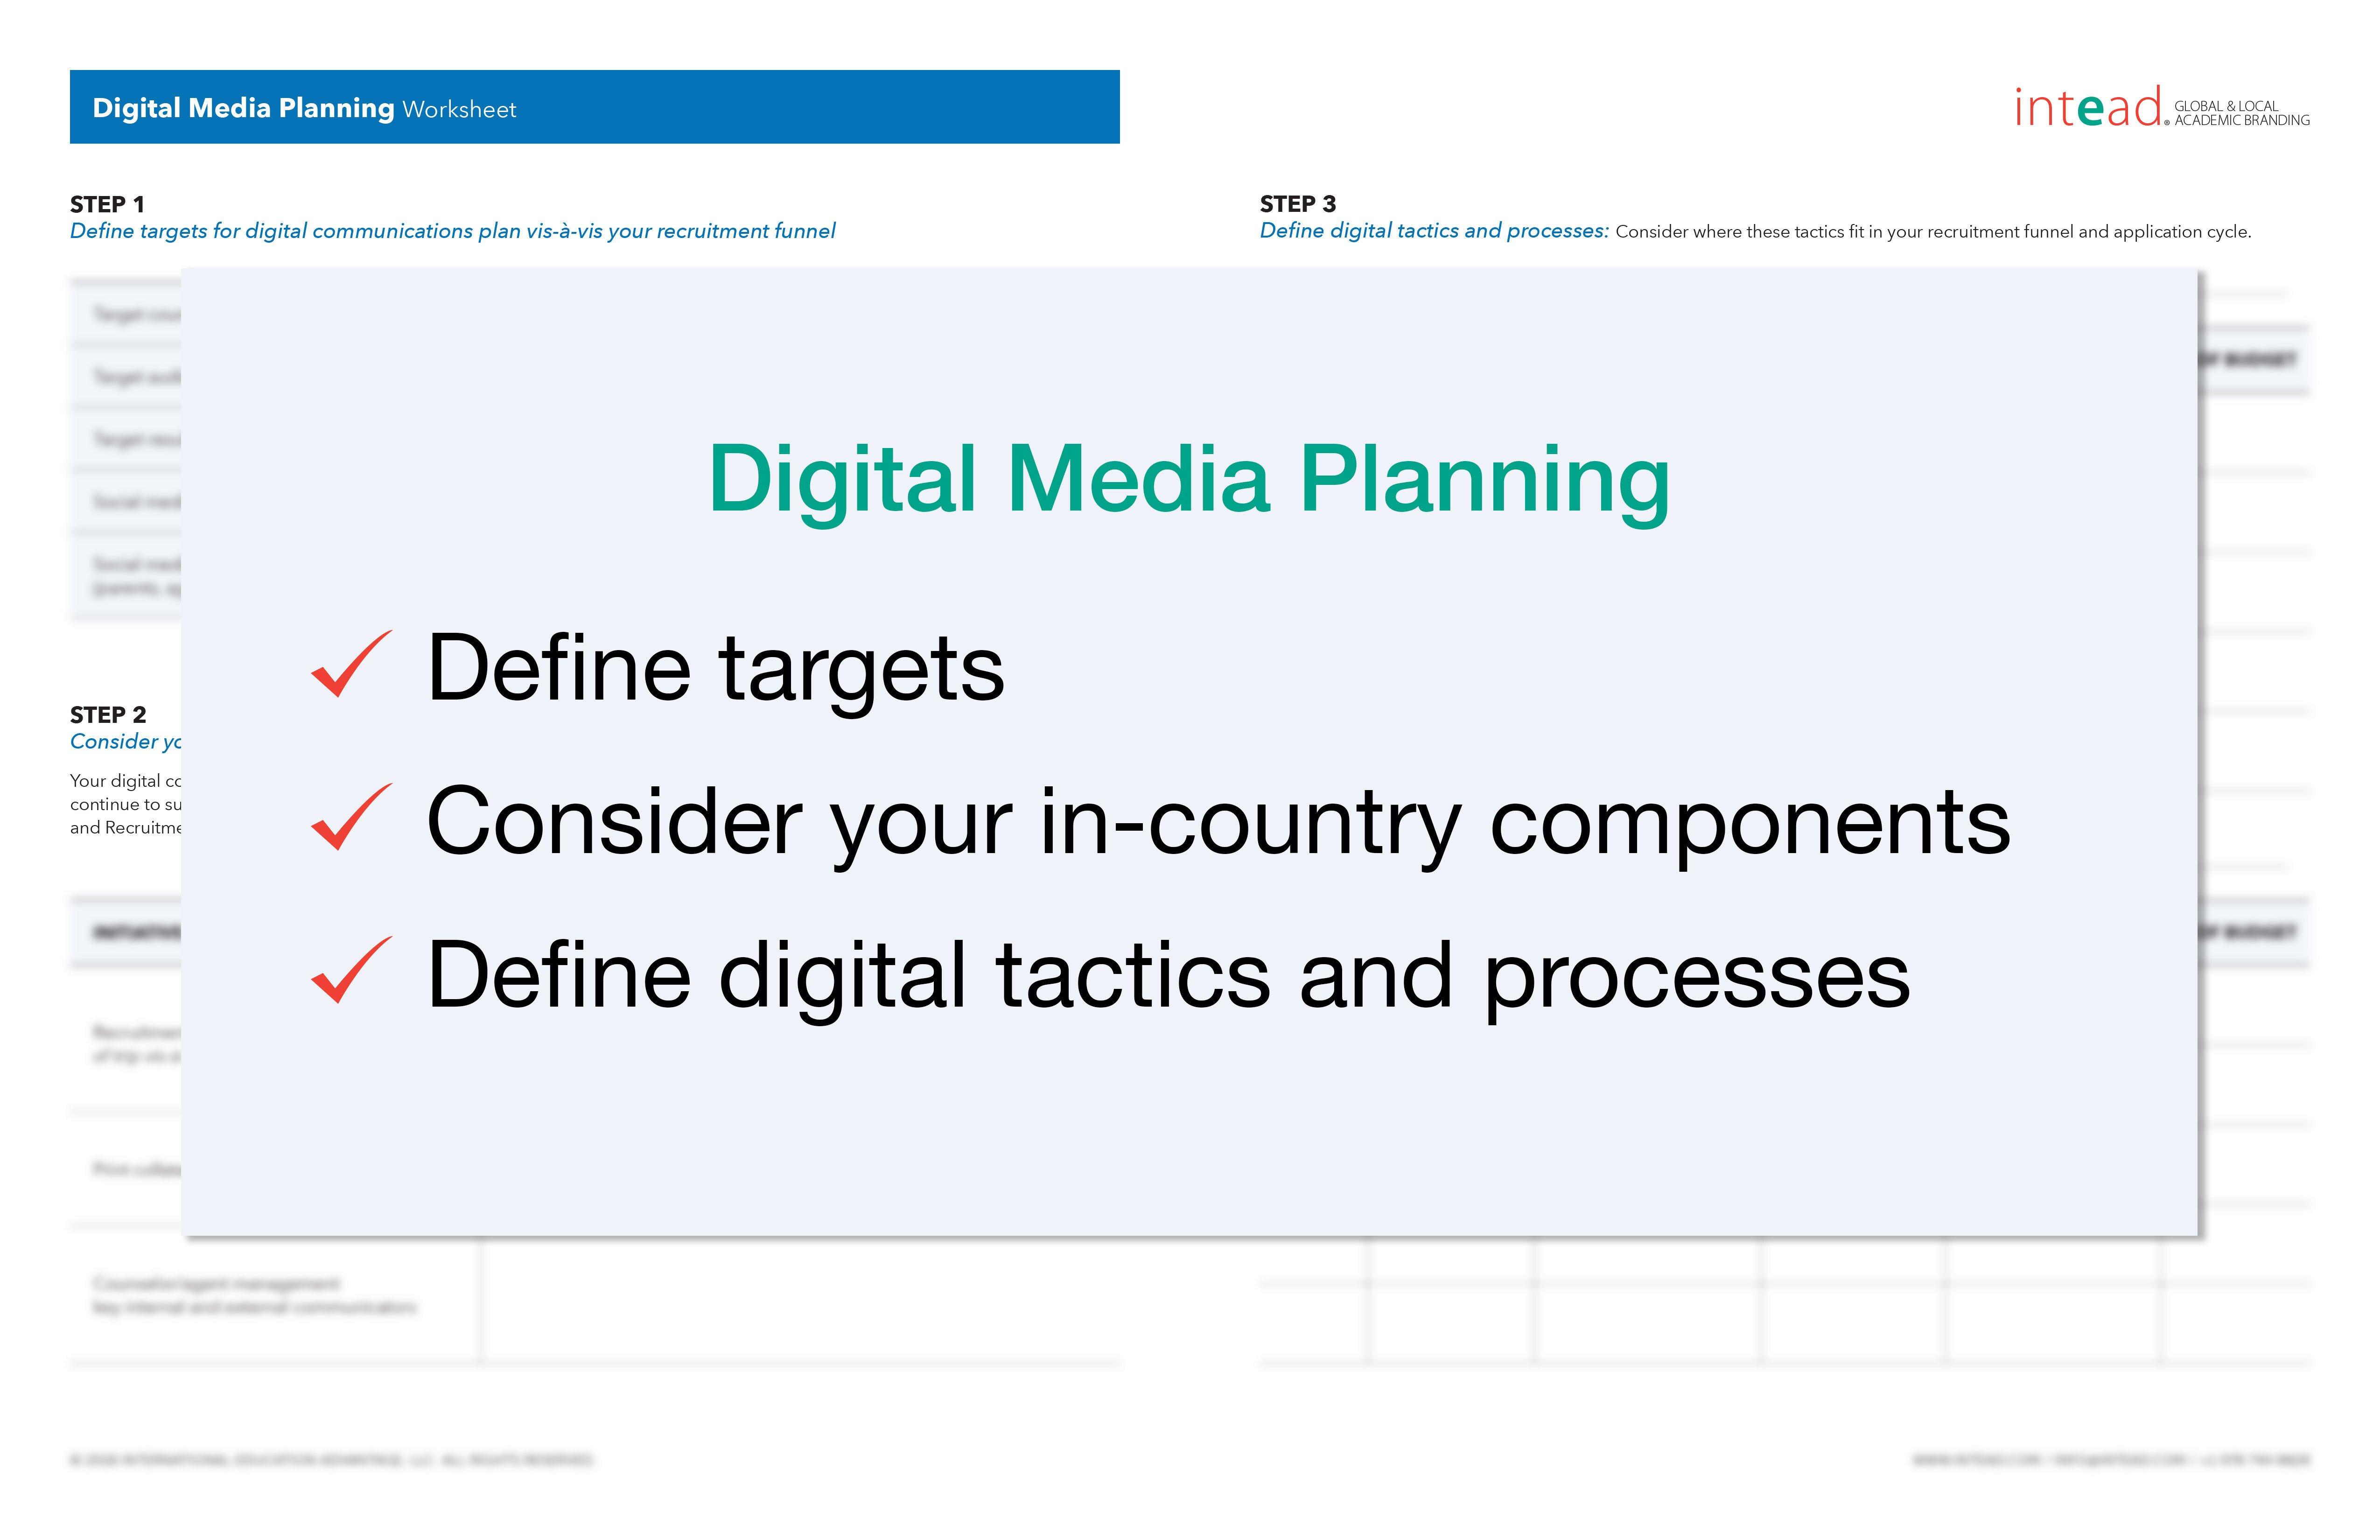 Digital Media Planning Worksheets